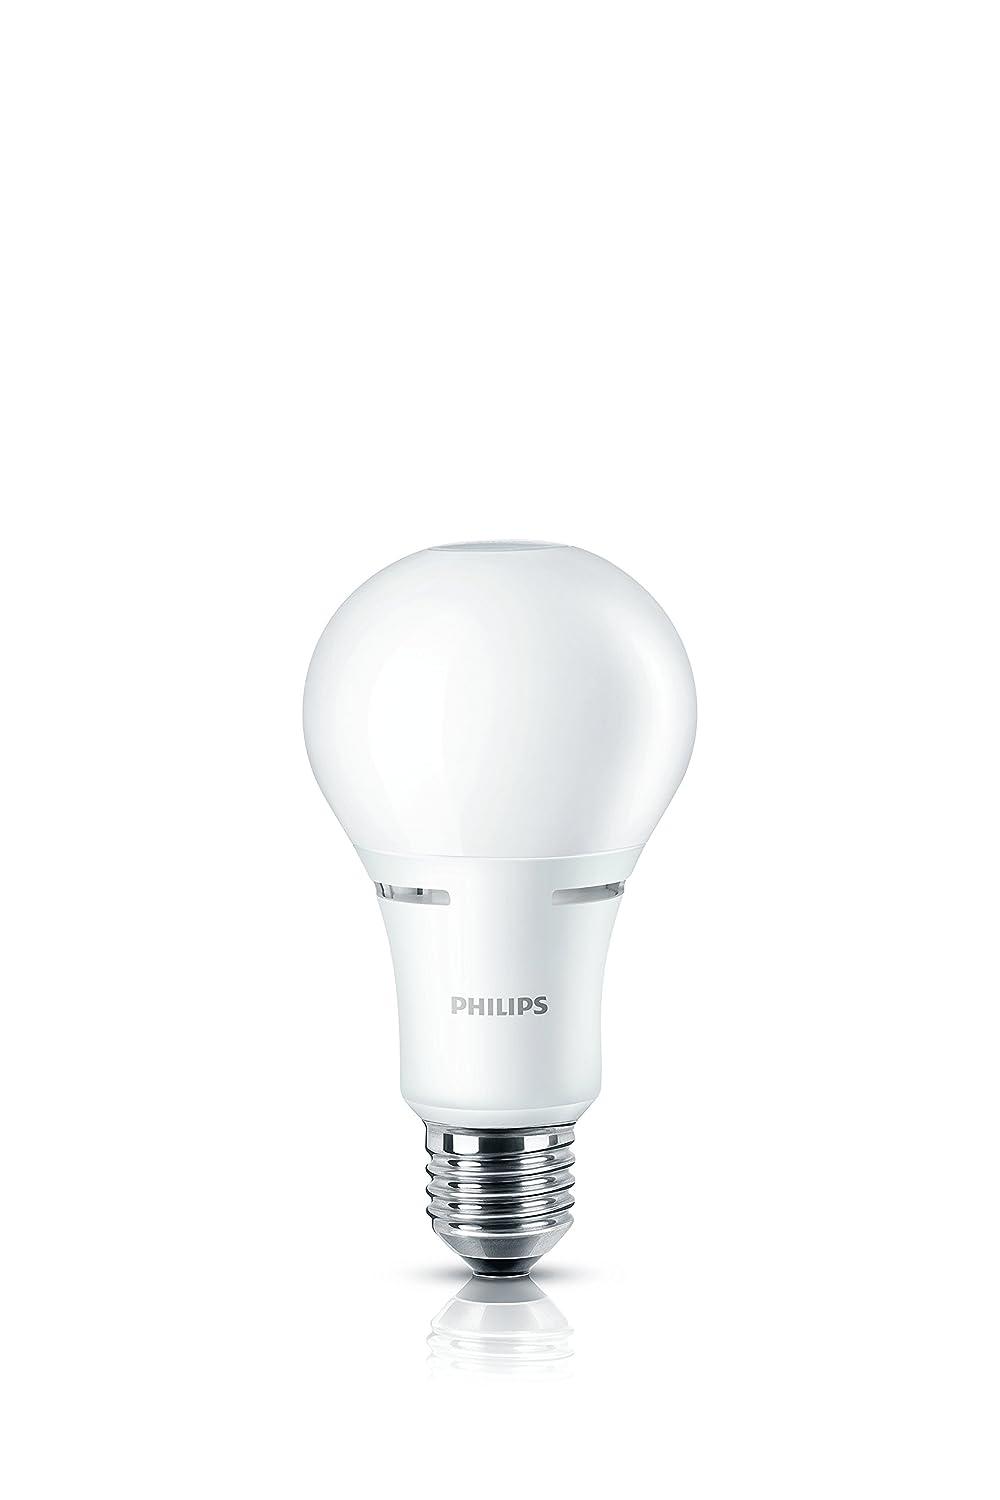 Philips 459172 Led 40/60/100W A21 Trilight Soft White (2700K),